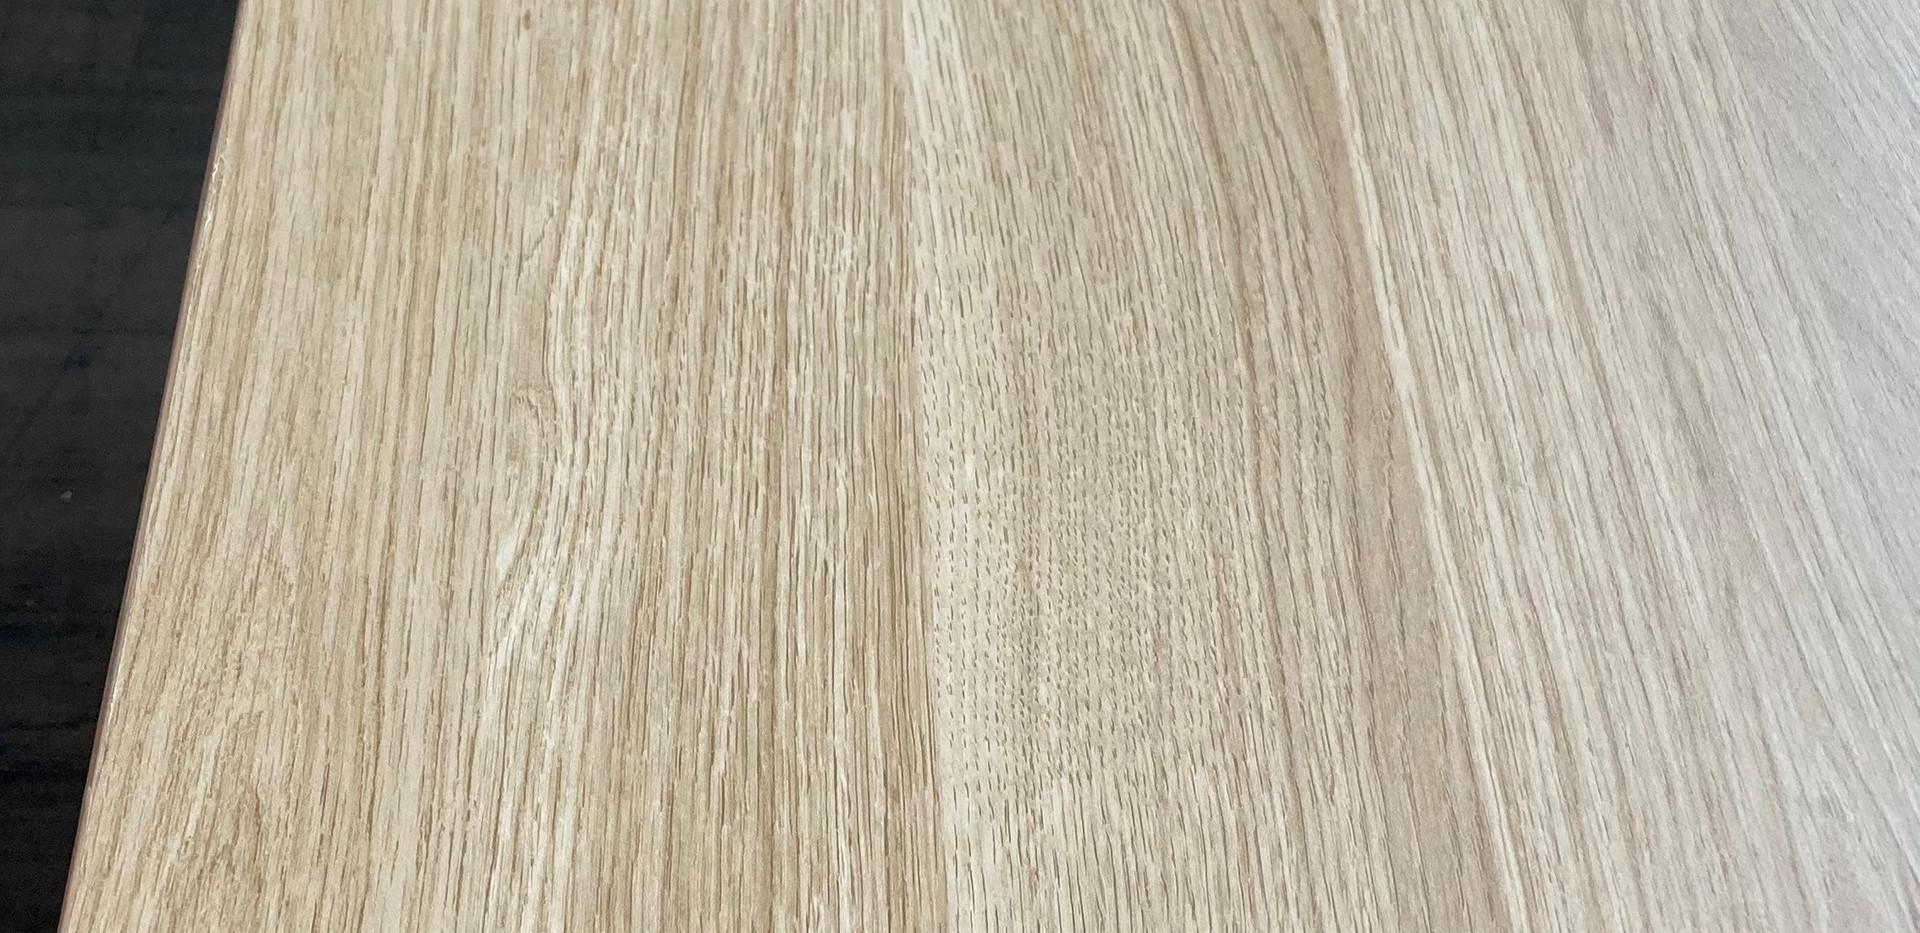 Mayshaw Elegant Oak Laminate table tops